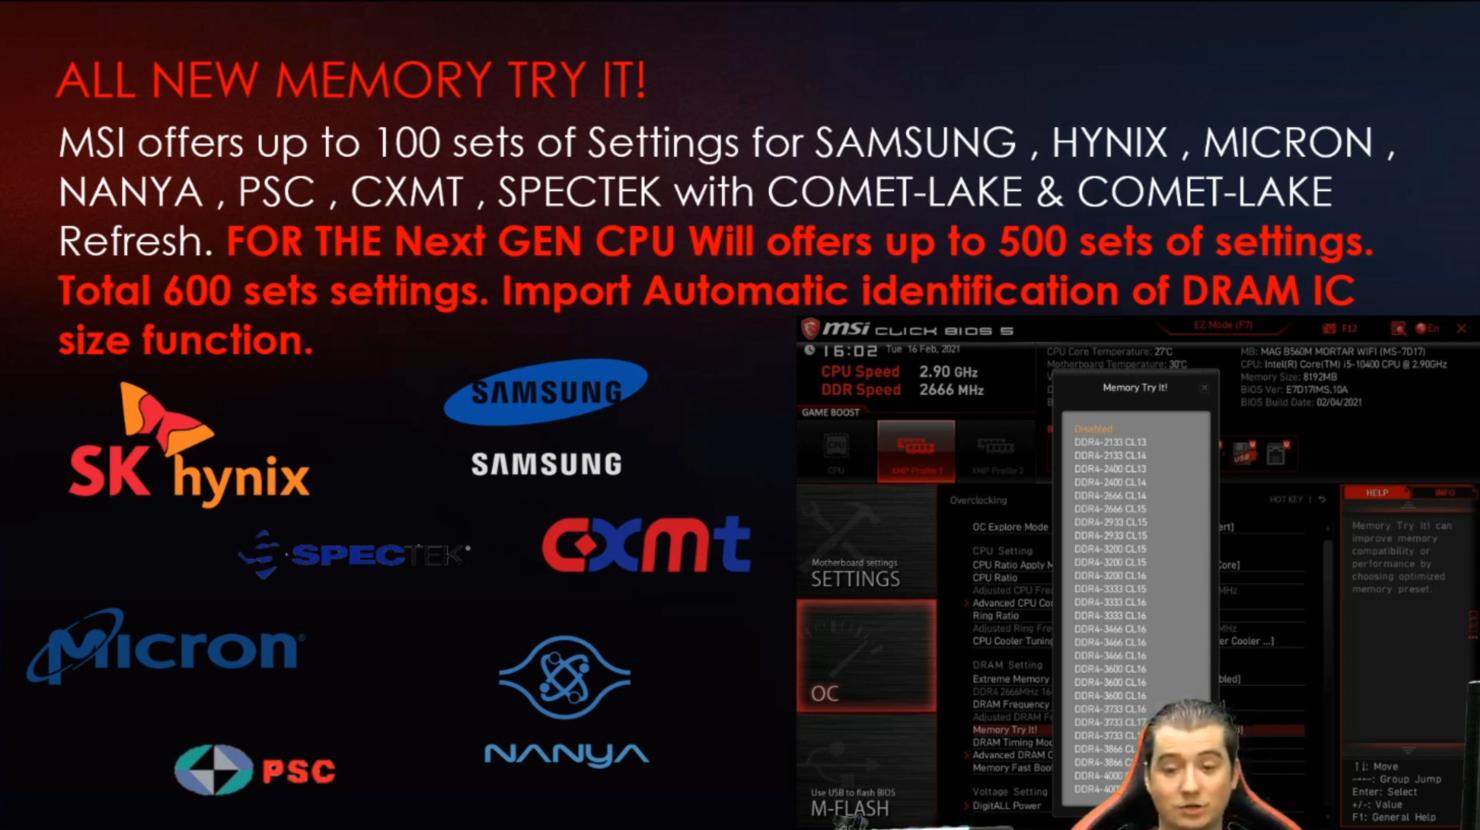 msi-b560-h510-motherboards-intel-10th-gen-11th-gen-desktop-cpus-_-prices-specs-_-memory-overclock-_3